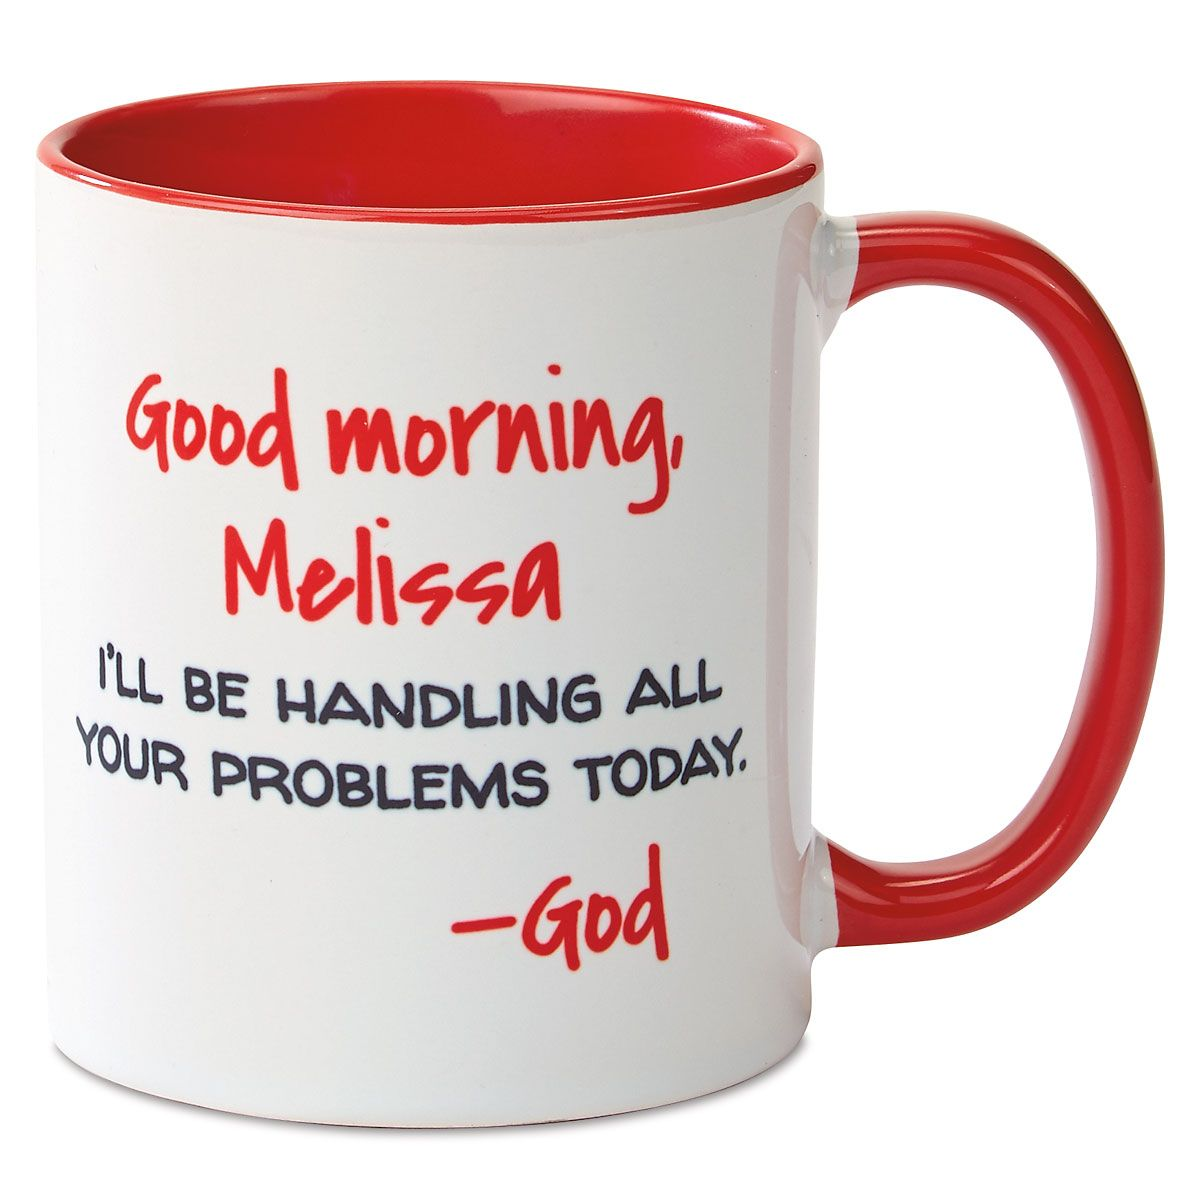 Good Morning Personalized Red Mug